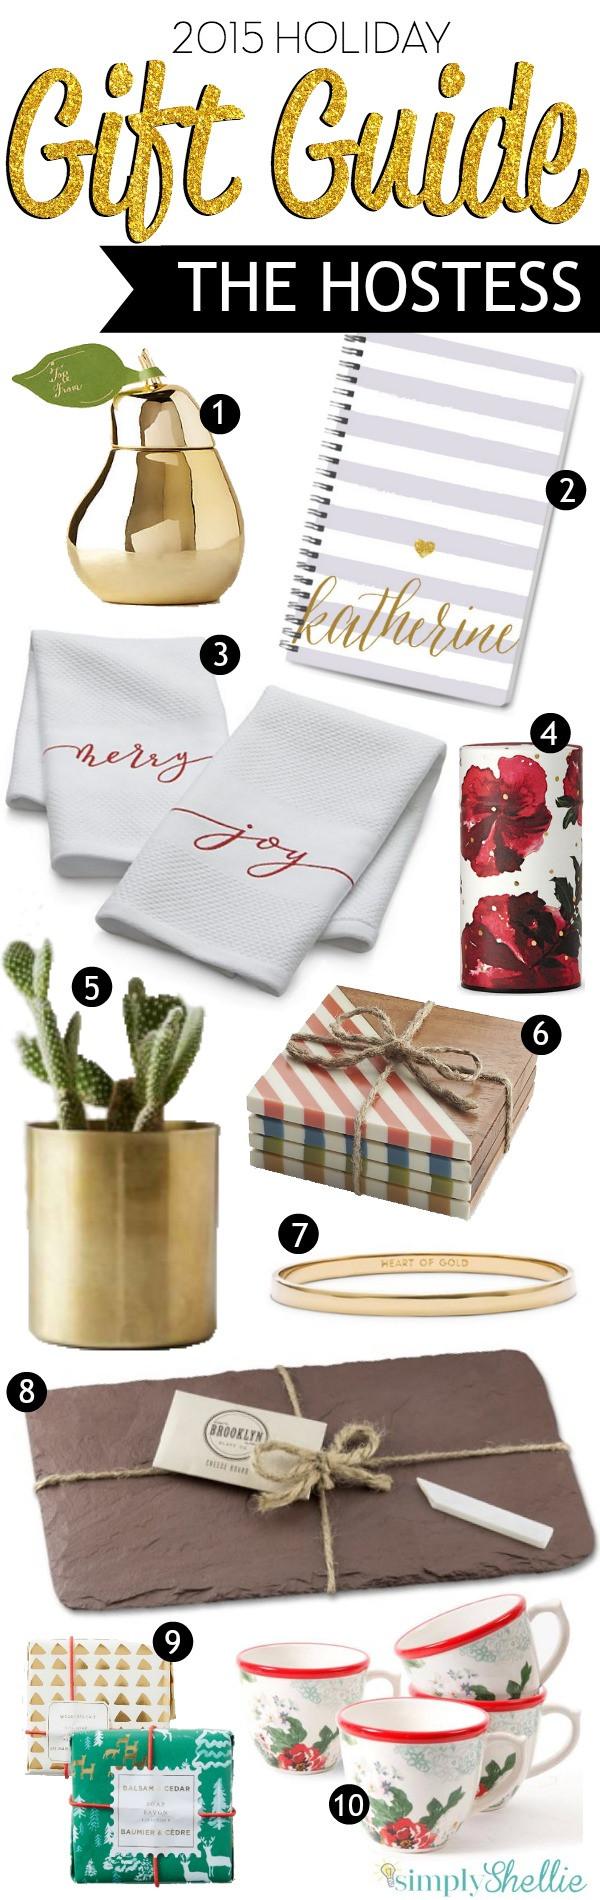 Christmas Hostess Gift Ideas  Holiday Gift Guide Fabulous Hostess Gift Ideas